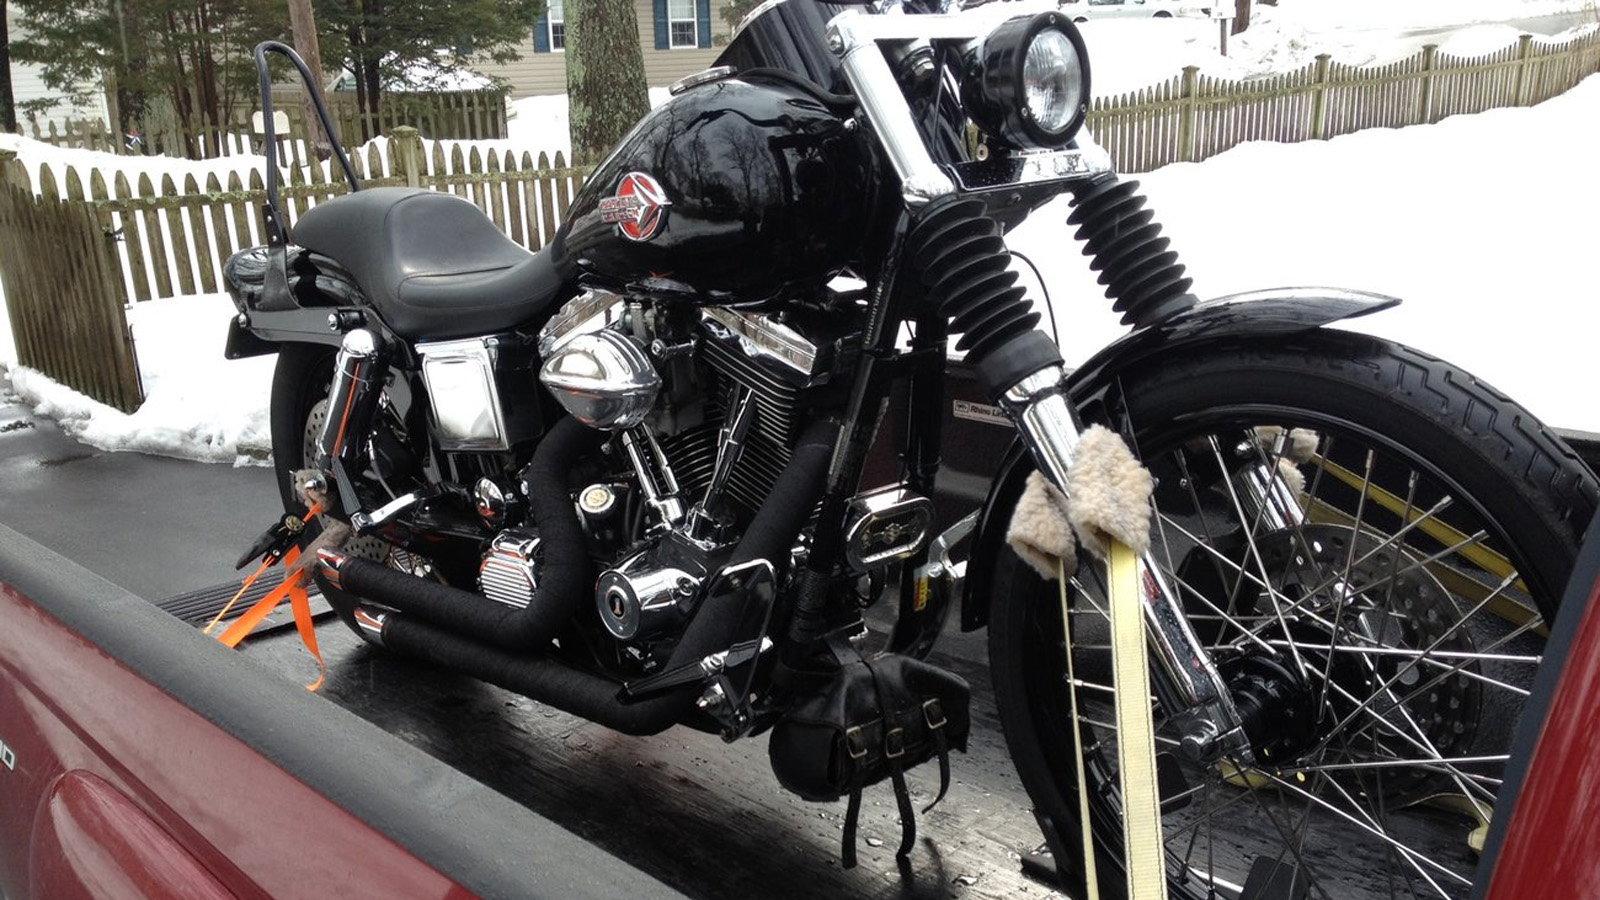 Bike Hauling: Load it right!